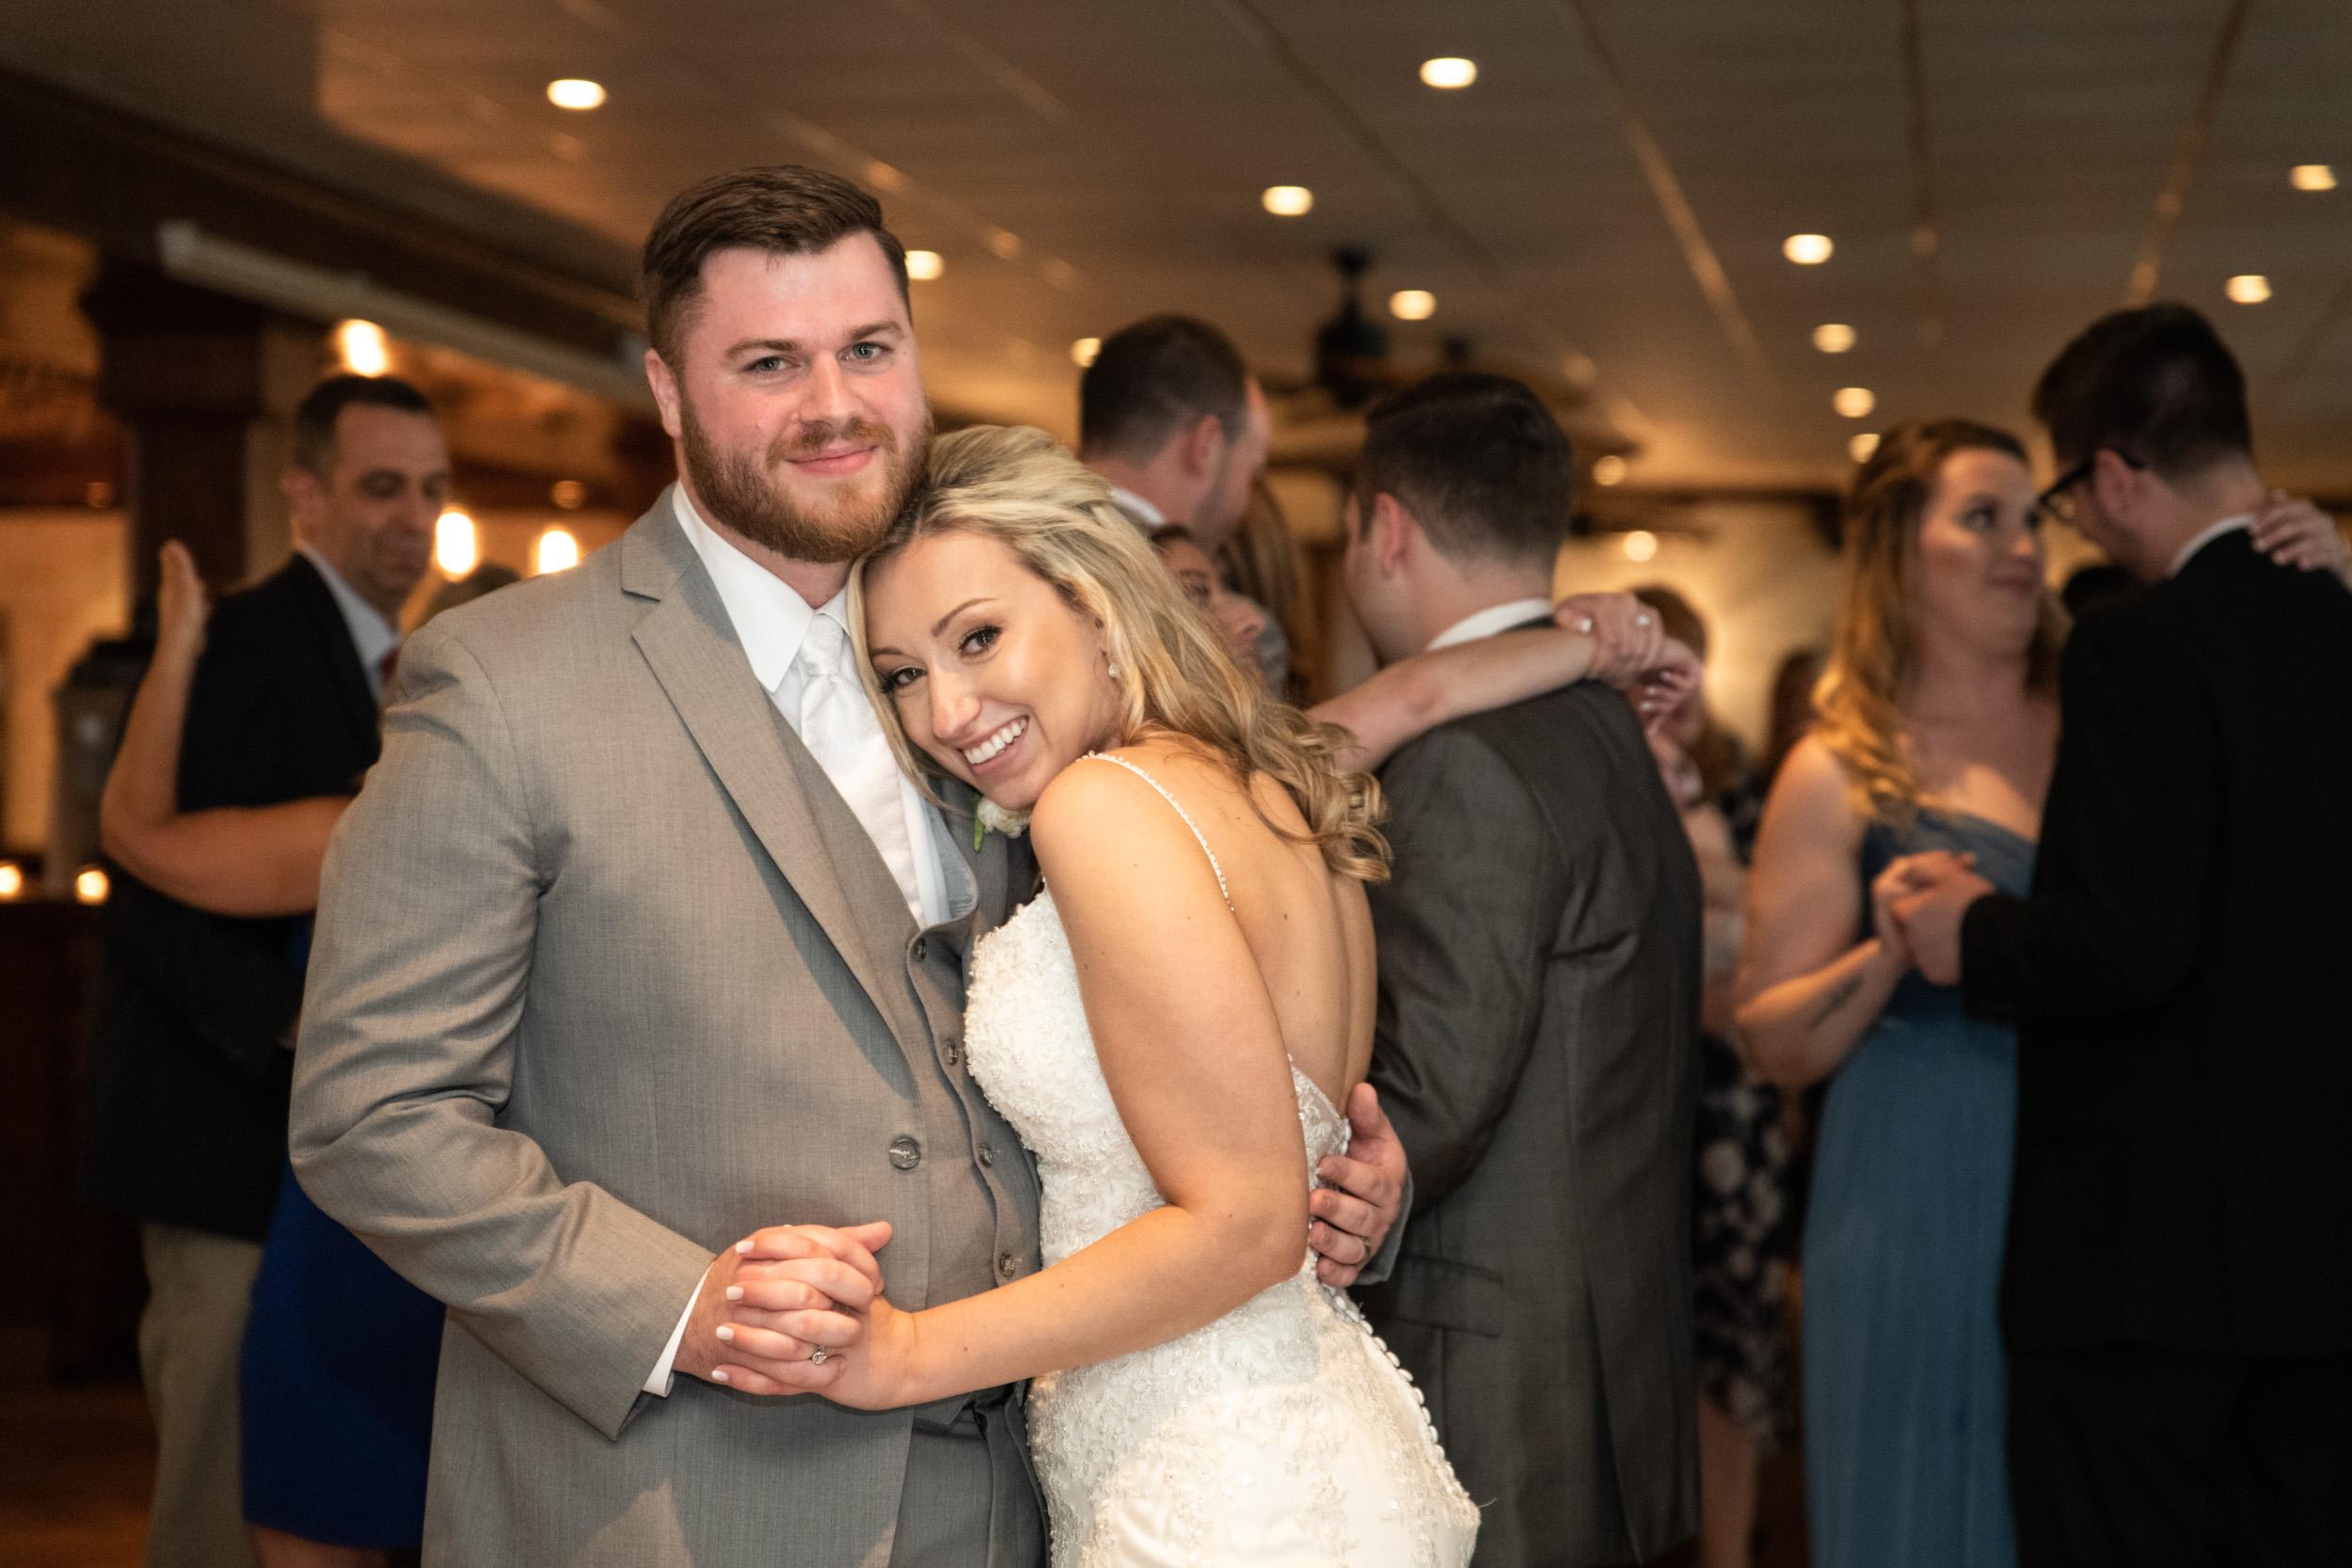 The Seashell Resort Wedding Reception Photos